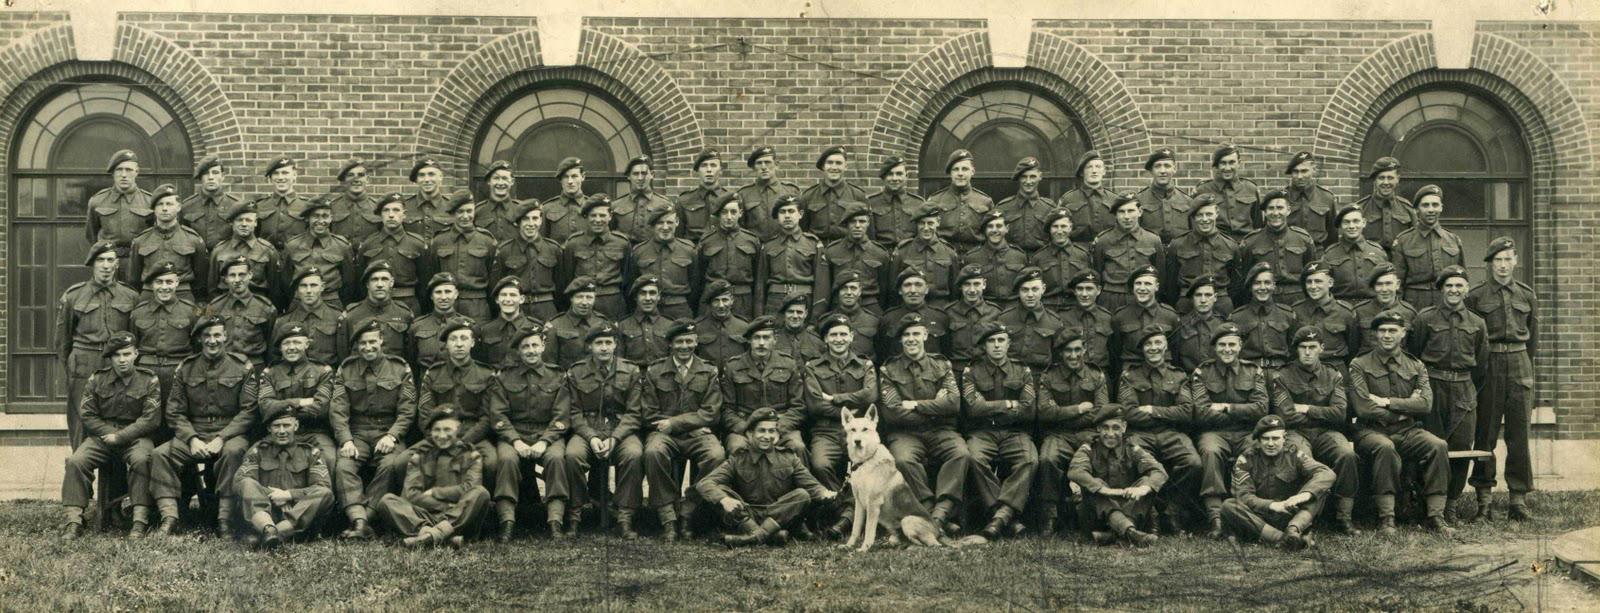 Private Emile Corteil with Glen - company photograph 1944